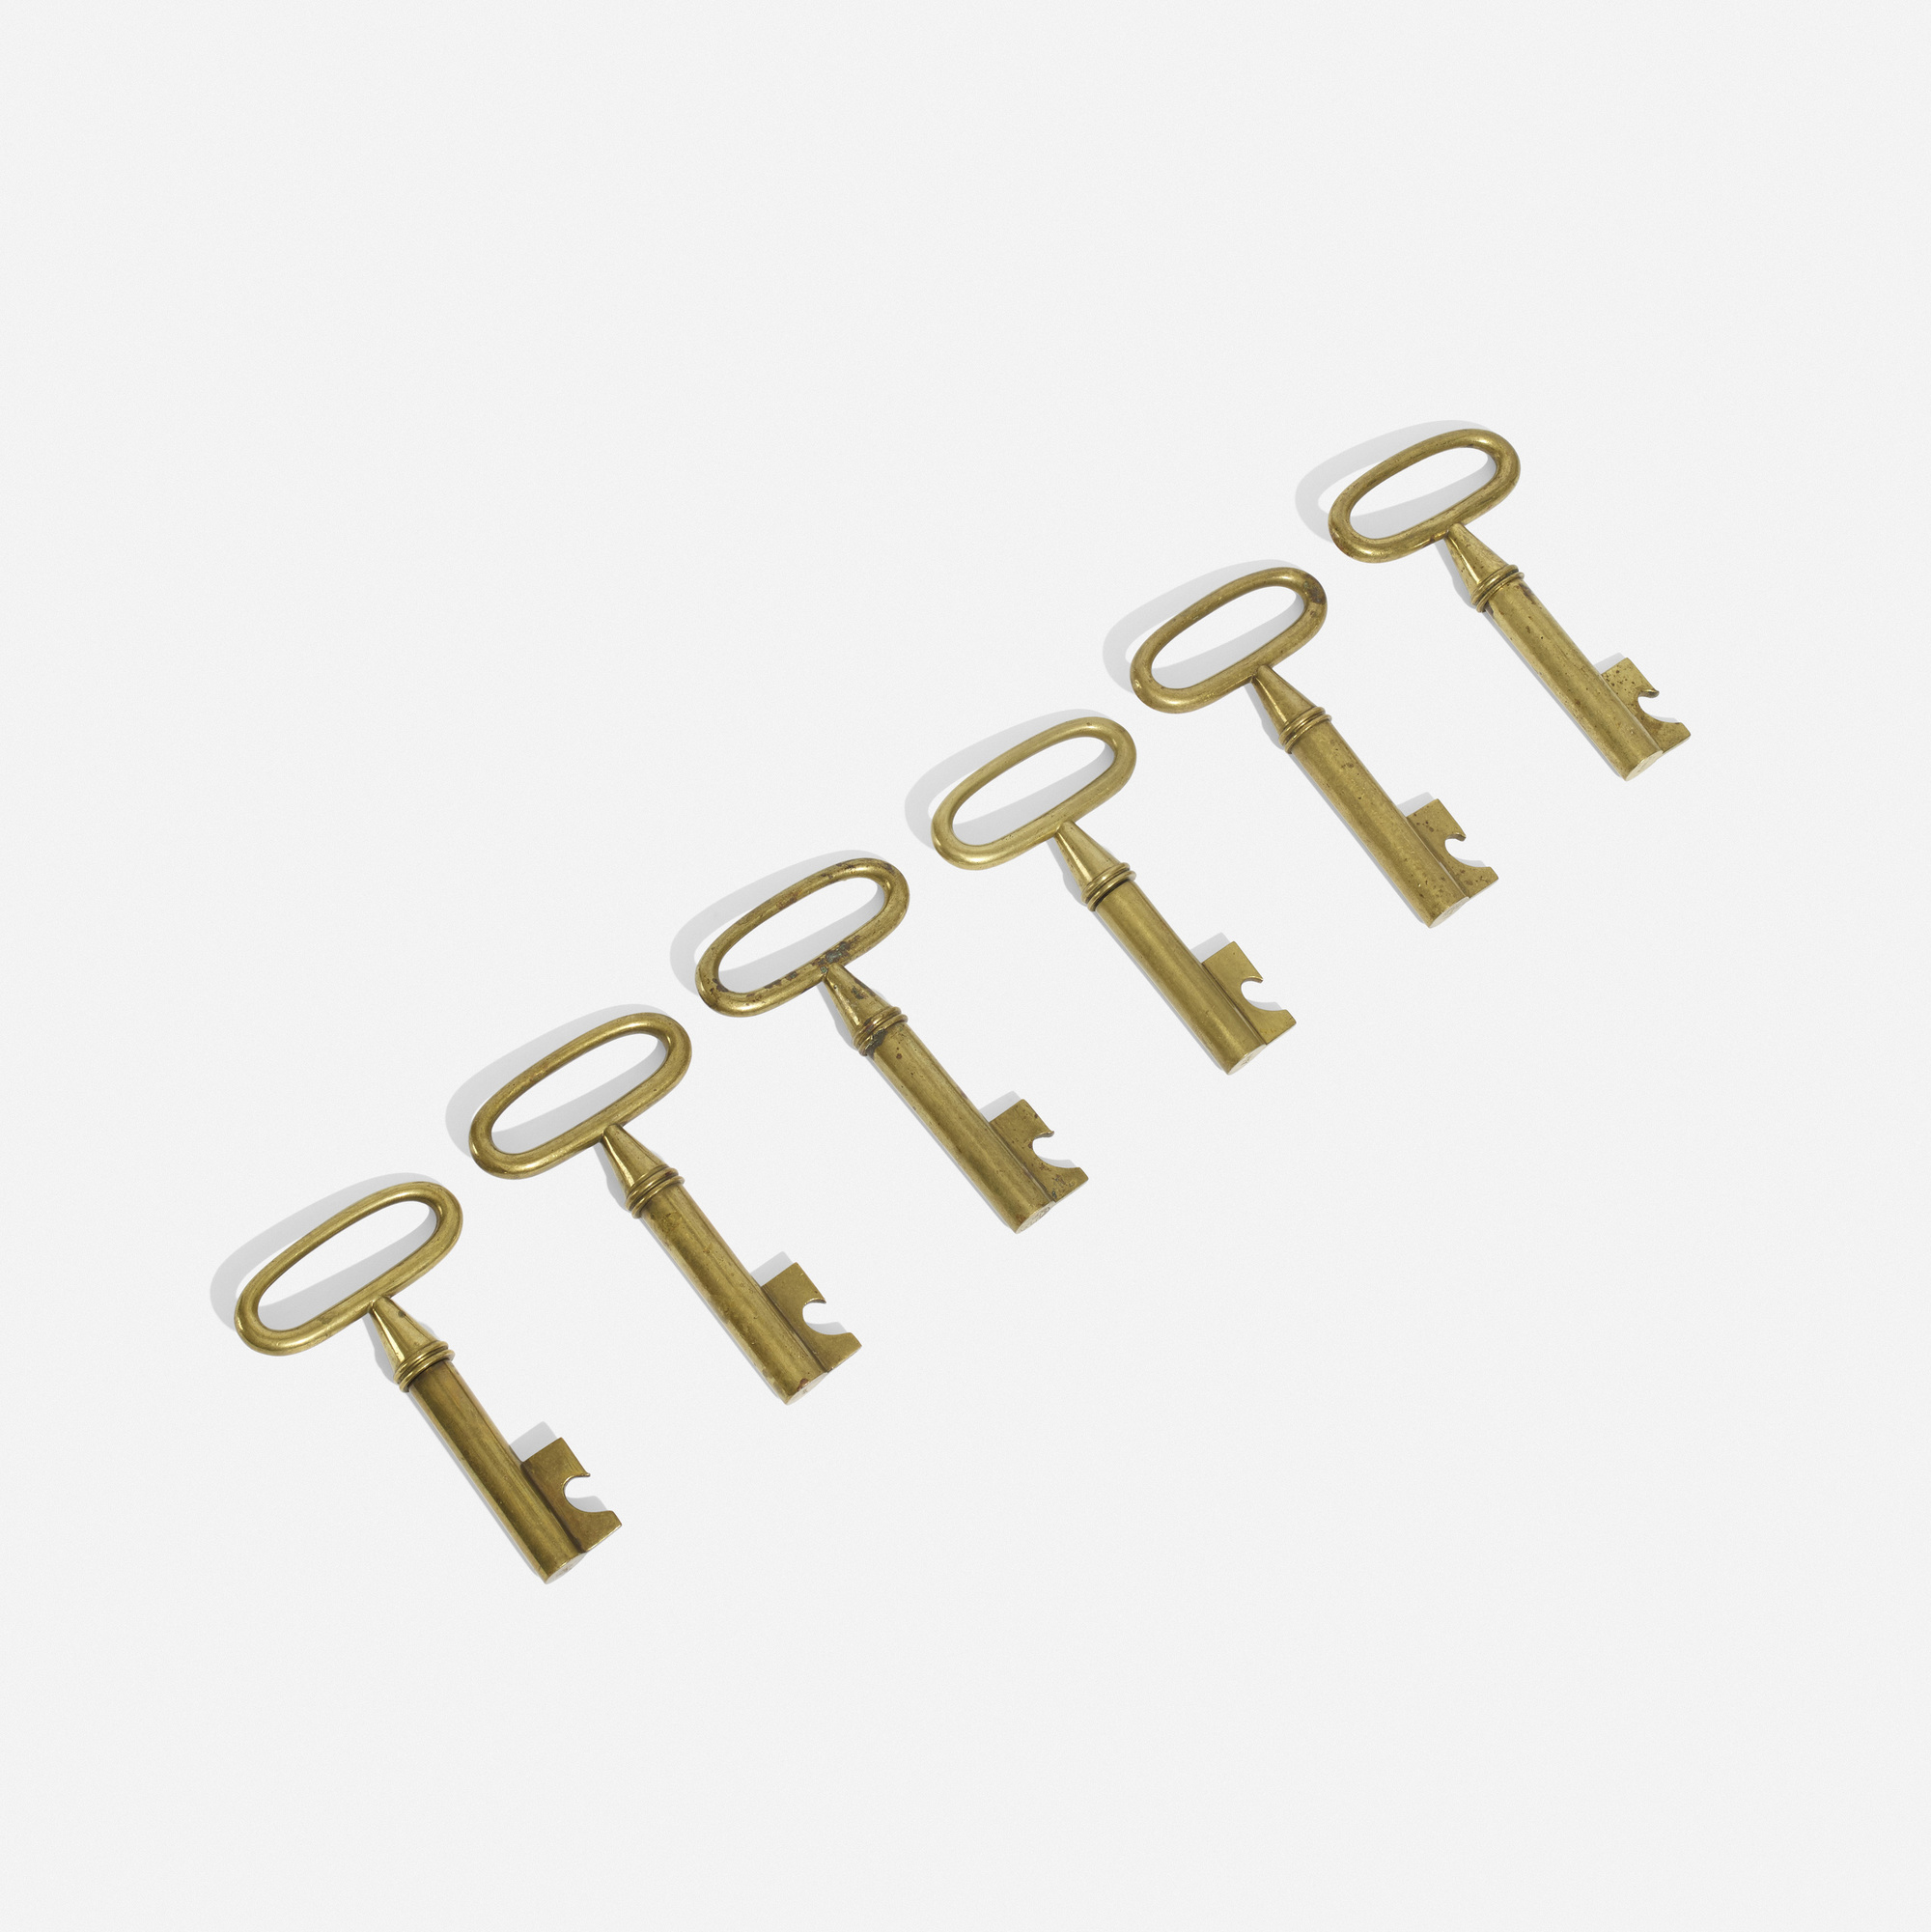 208: Carl Auböck II / corkscrews, set of six (1 of 3)